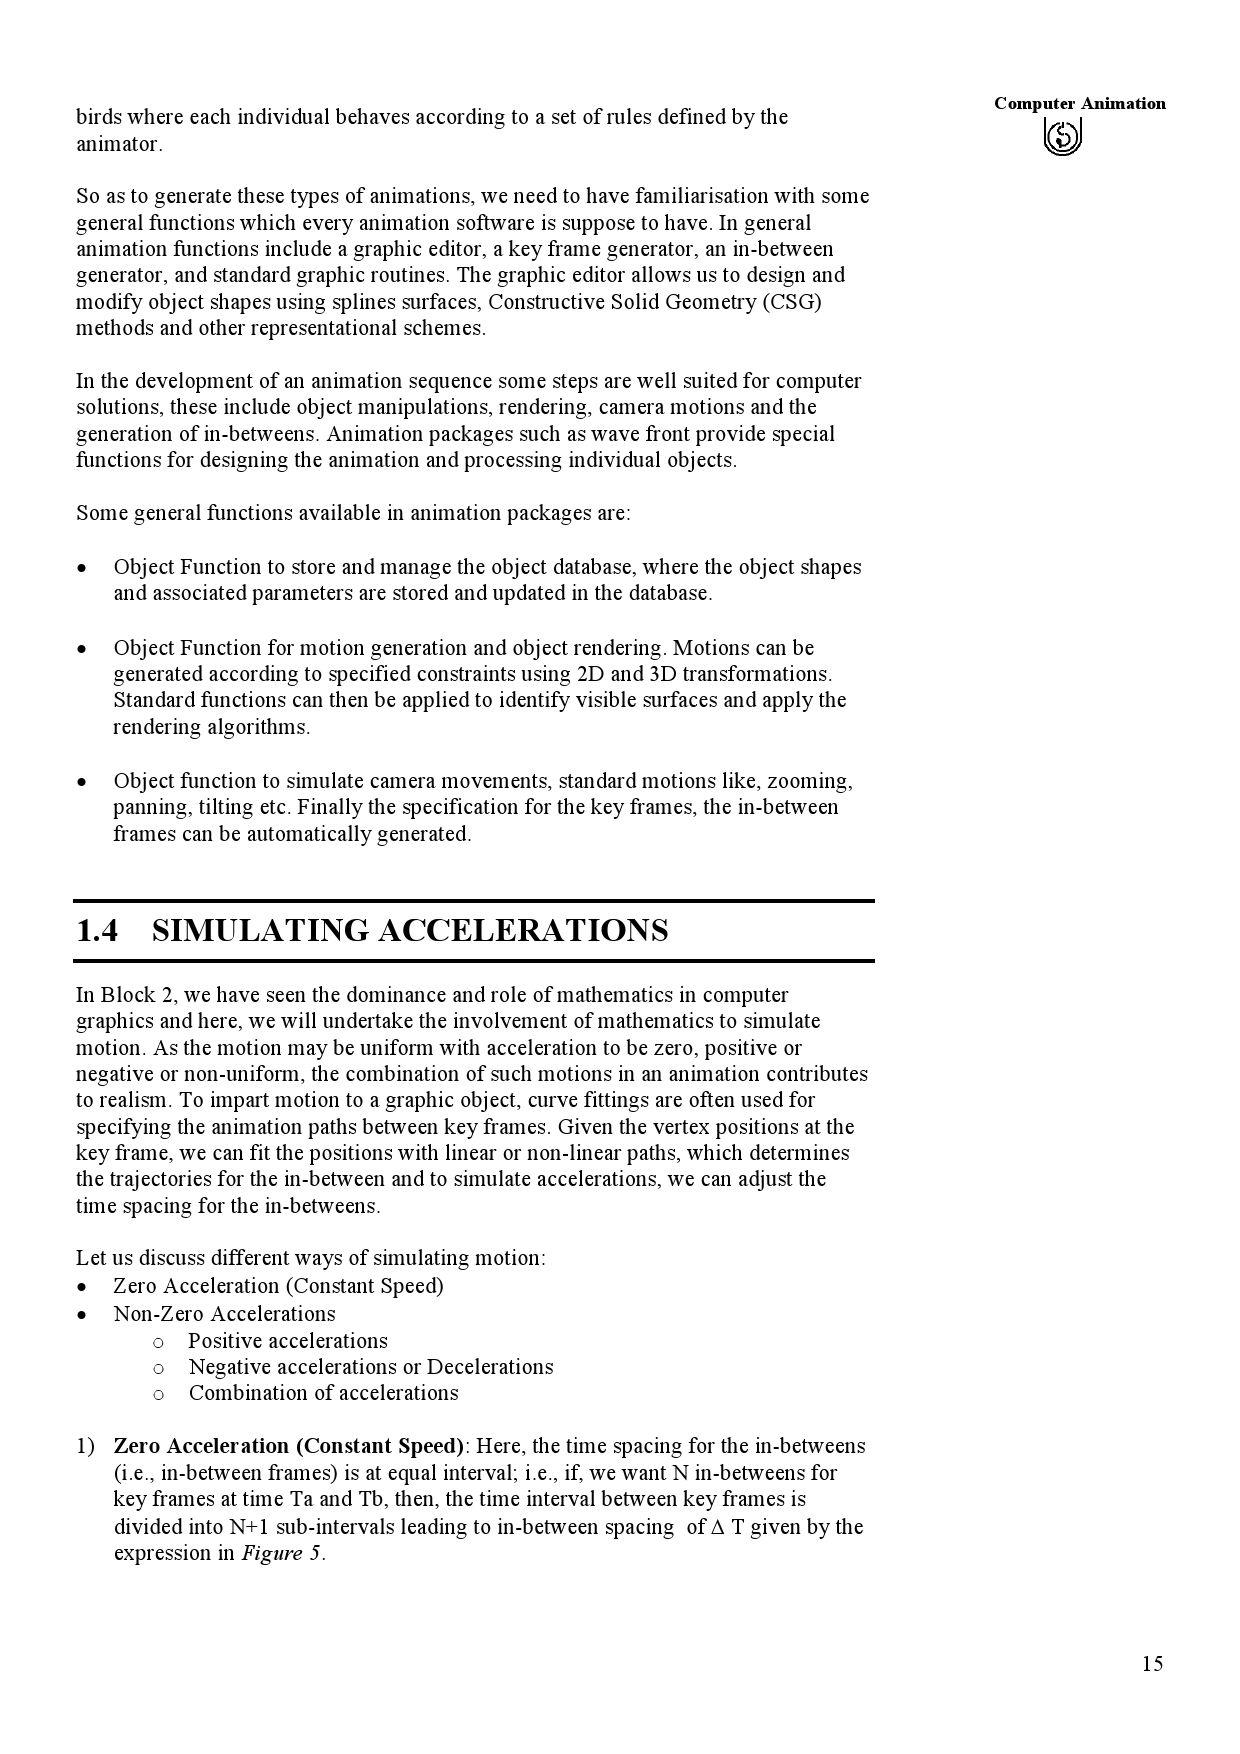 MCS-053 IGNOU STUDY MATERIAL by IGNOU MCA - issuu